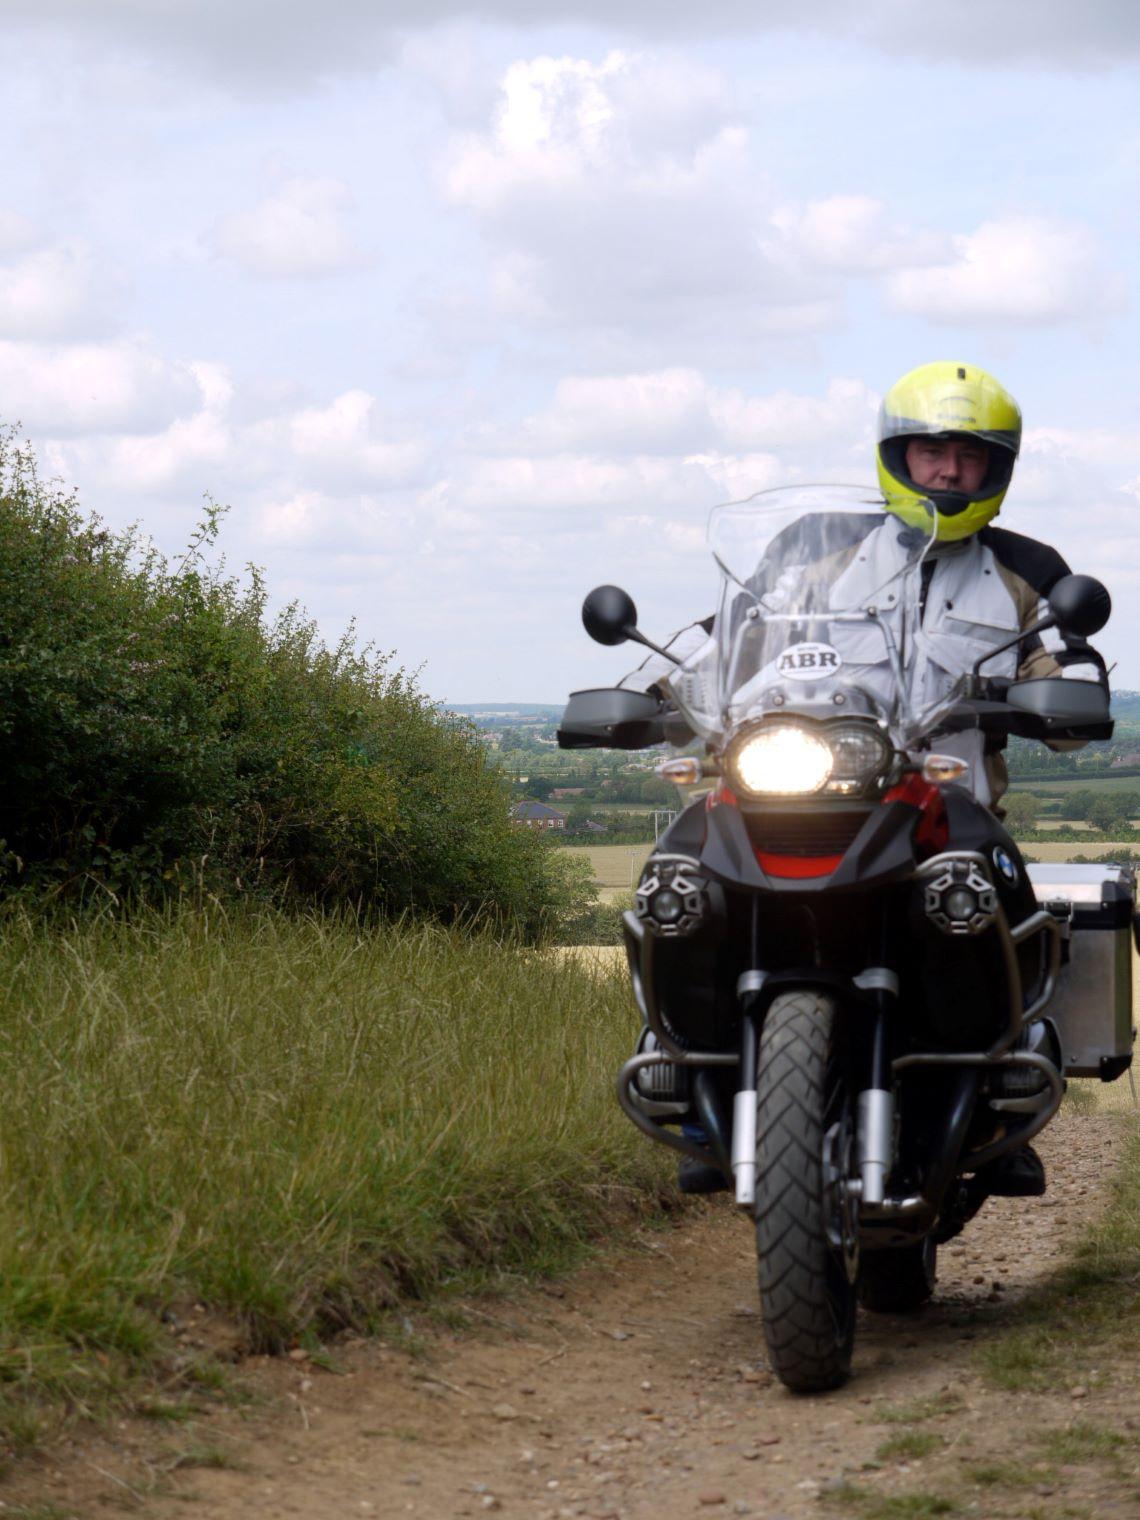 BMW-R-1200-GS-Adventure-riding